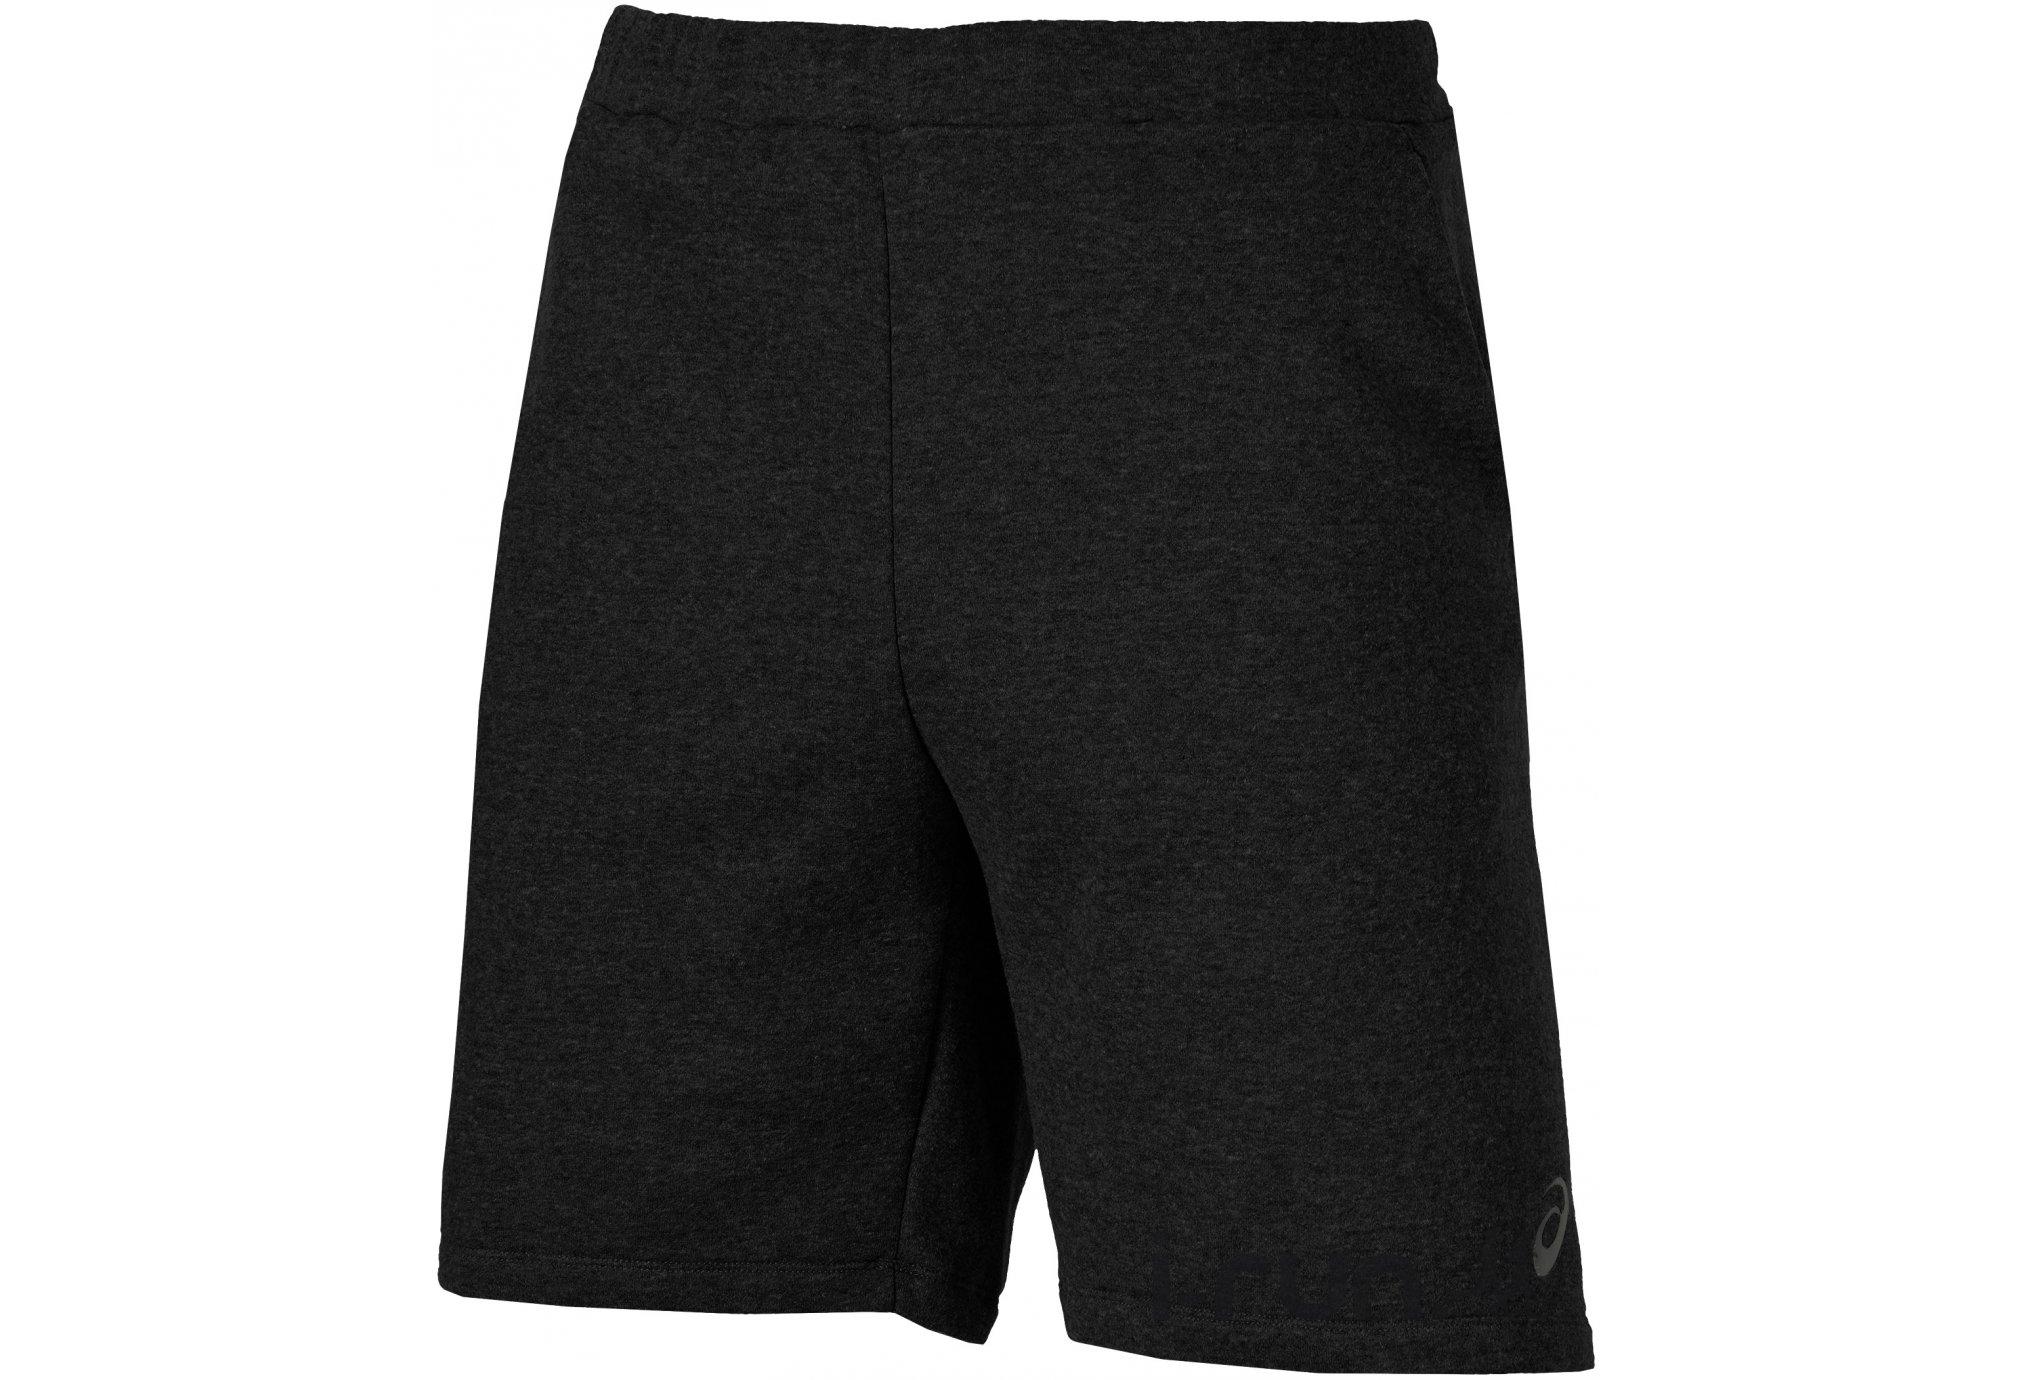 Asics Short Knit 9 M vêtement running homme